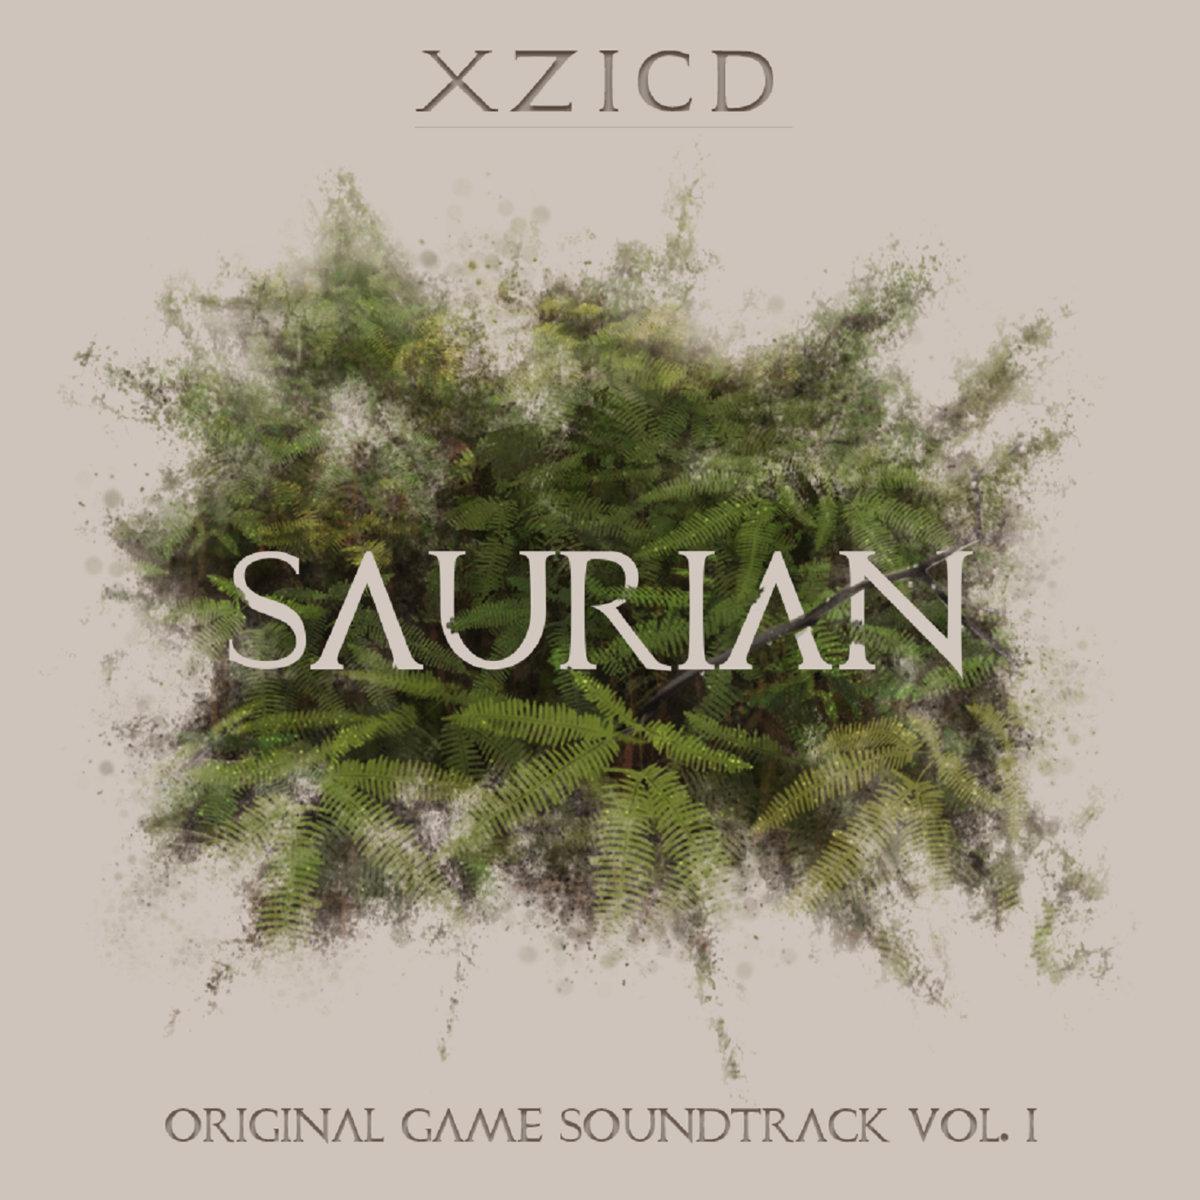 Saurian - Original Game Soundtrack Vol  I | XZICD